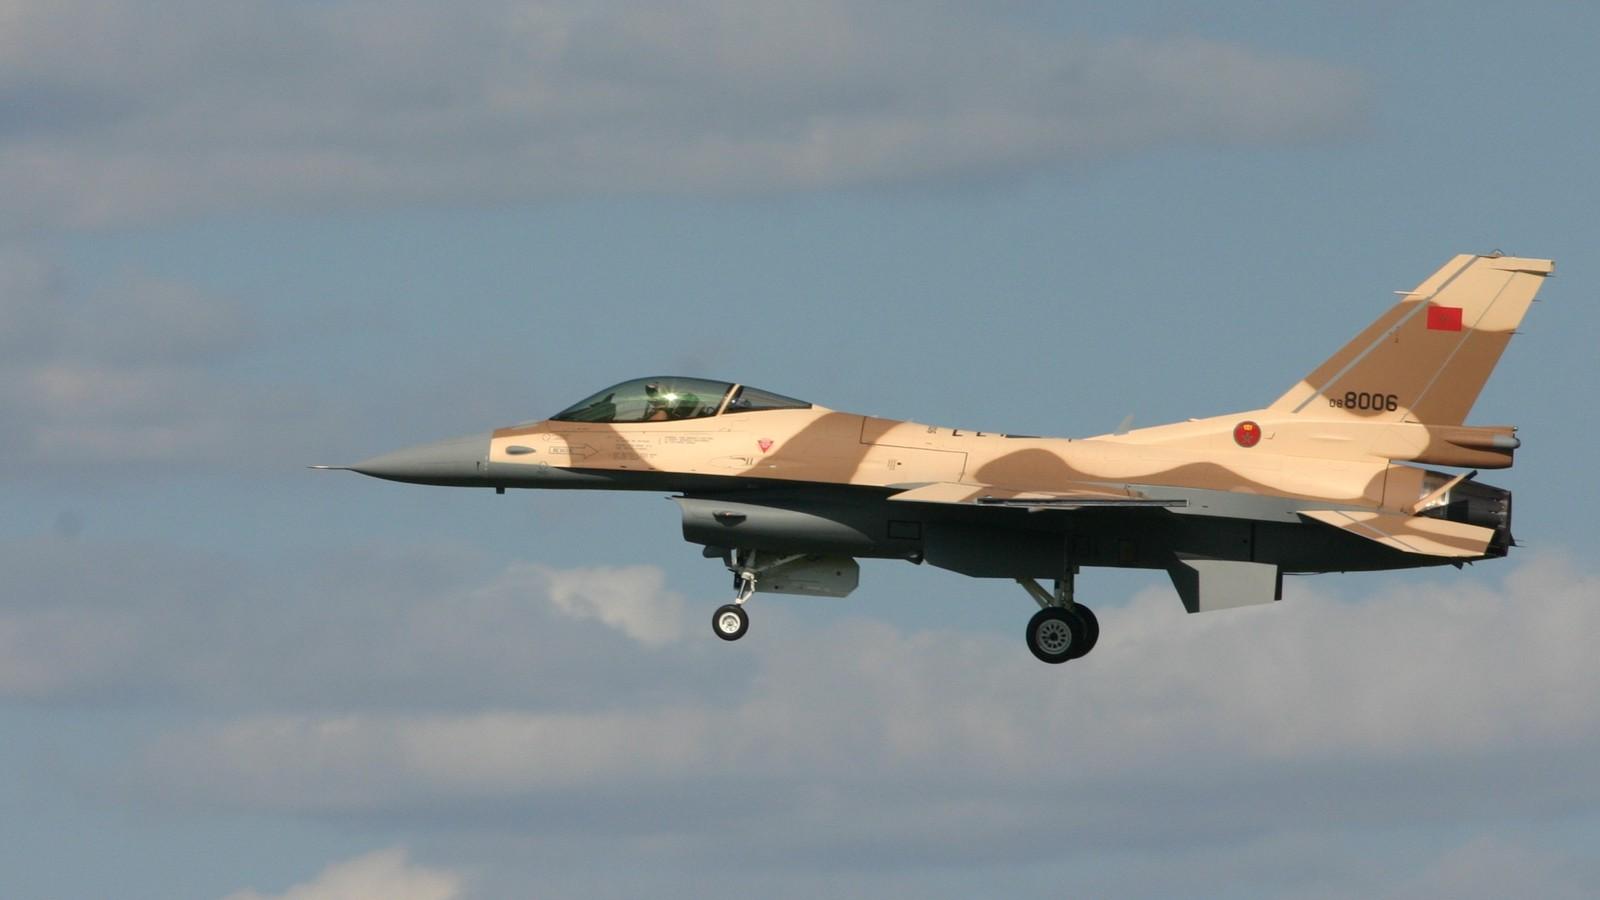 Photos RMAF F-16 C/D Block 52+ - Page 12 47710640181_bf594f7795_o